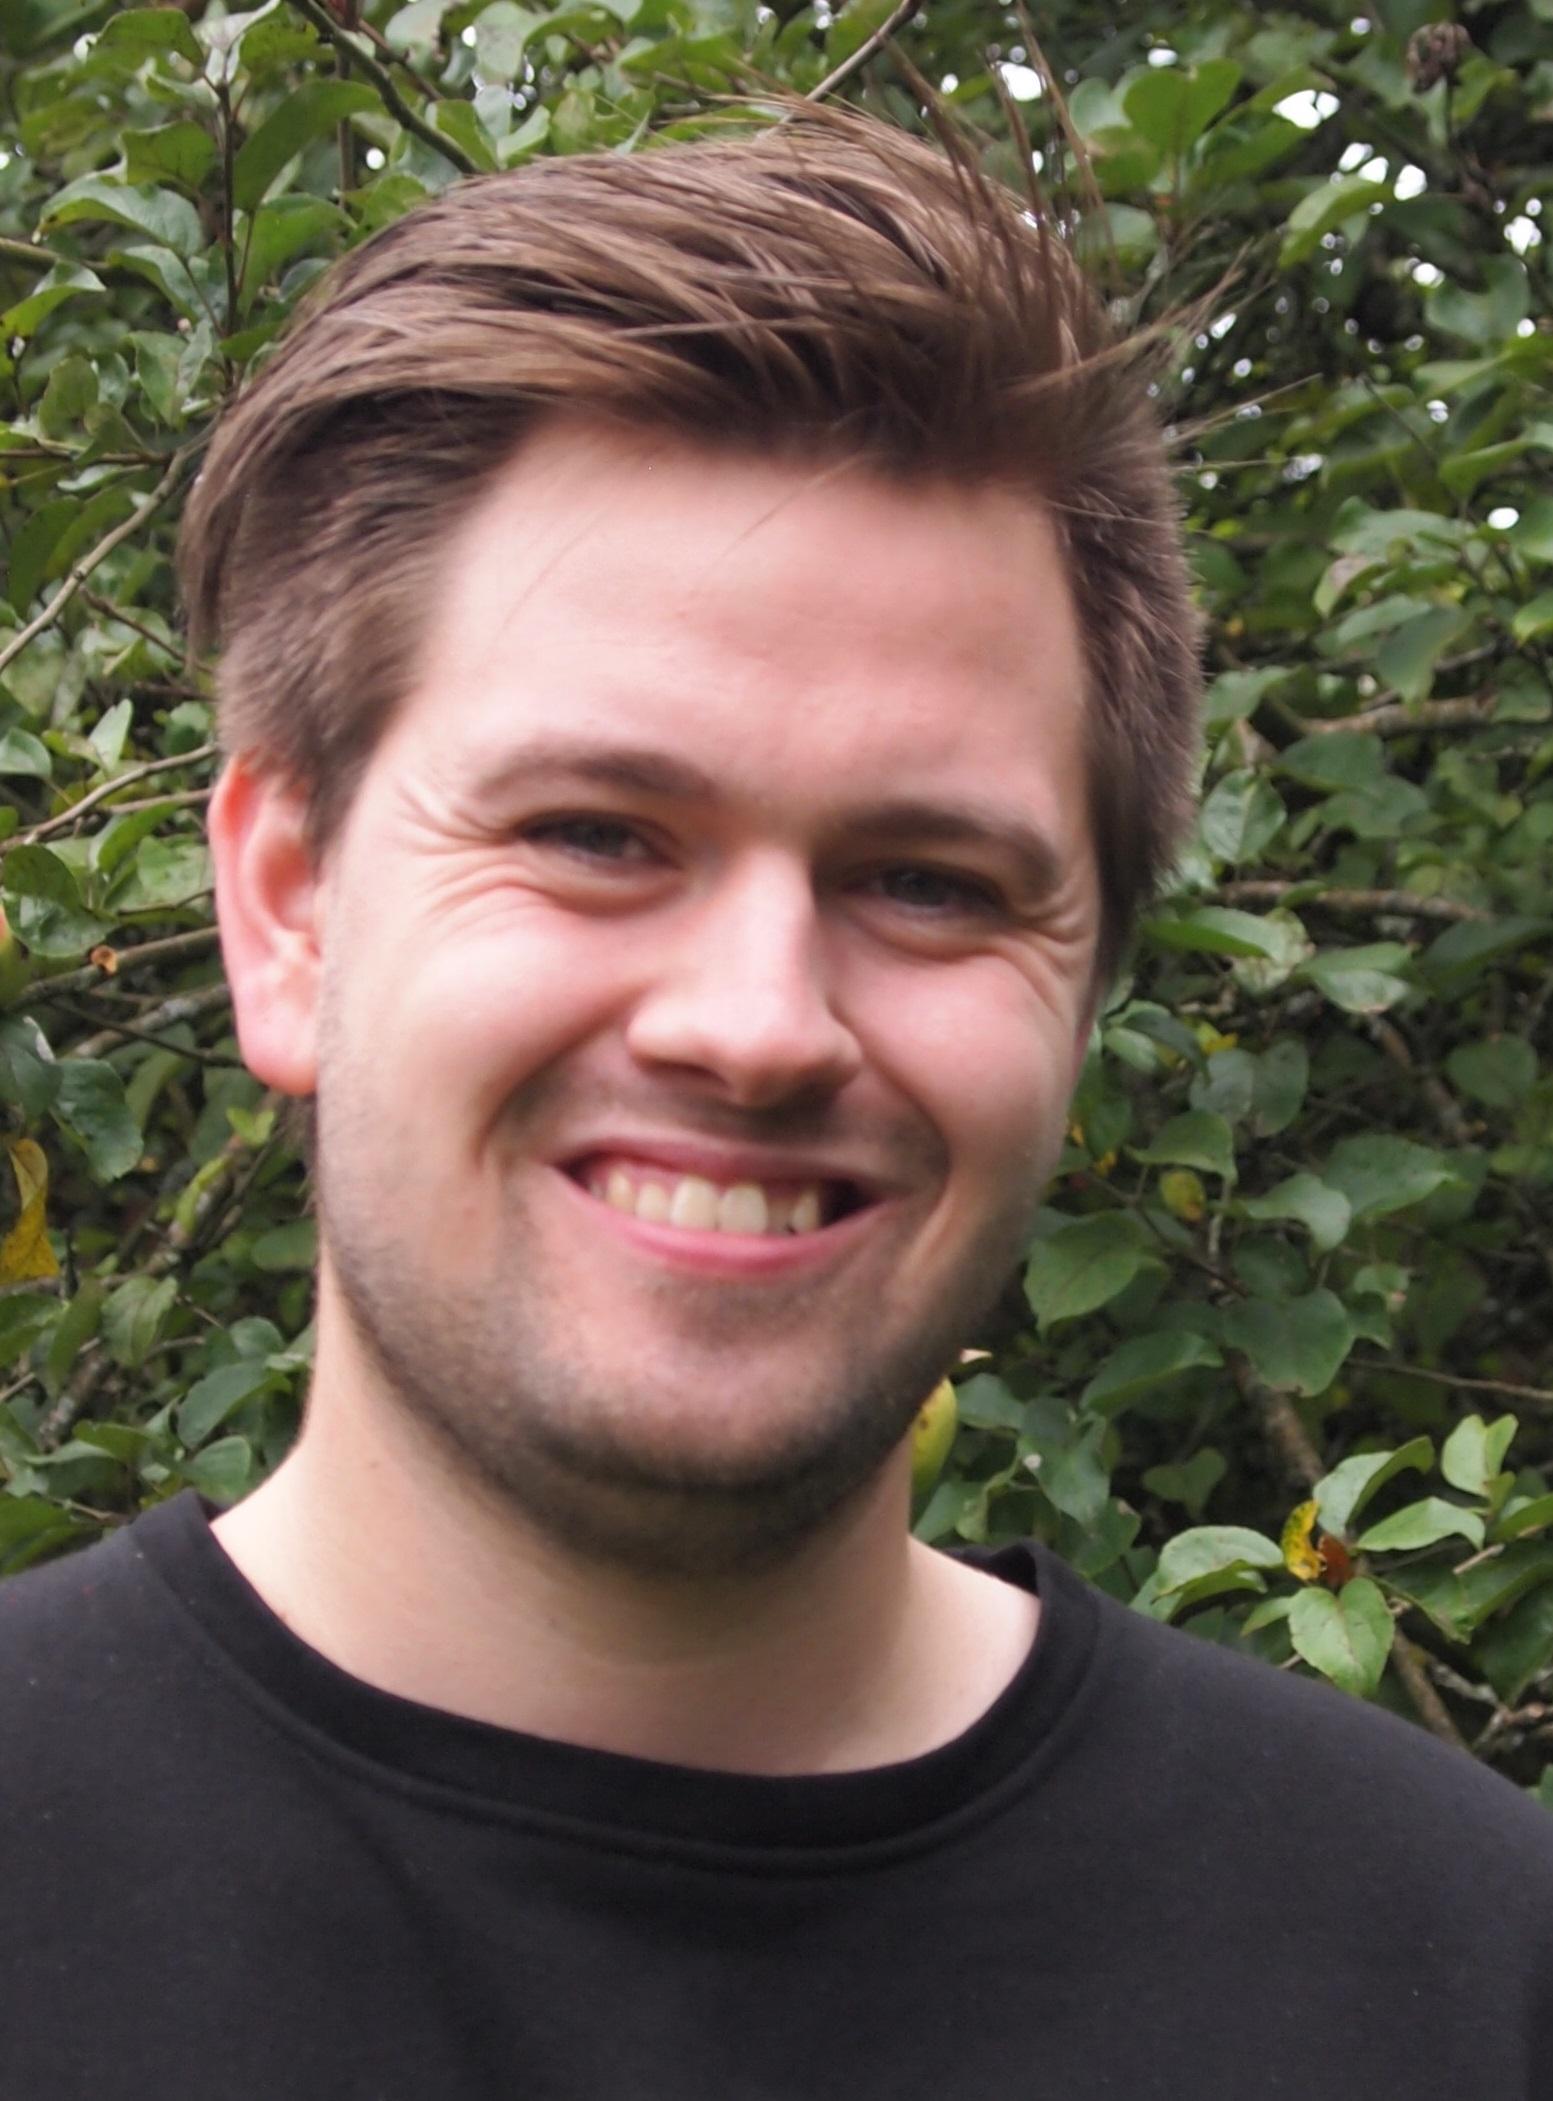 Jonathan Vigilius Ungdomssekretær for Retten til Liv